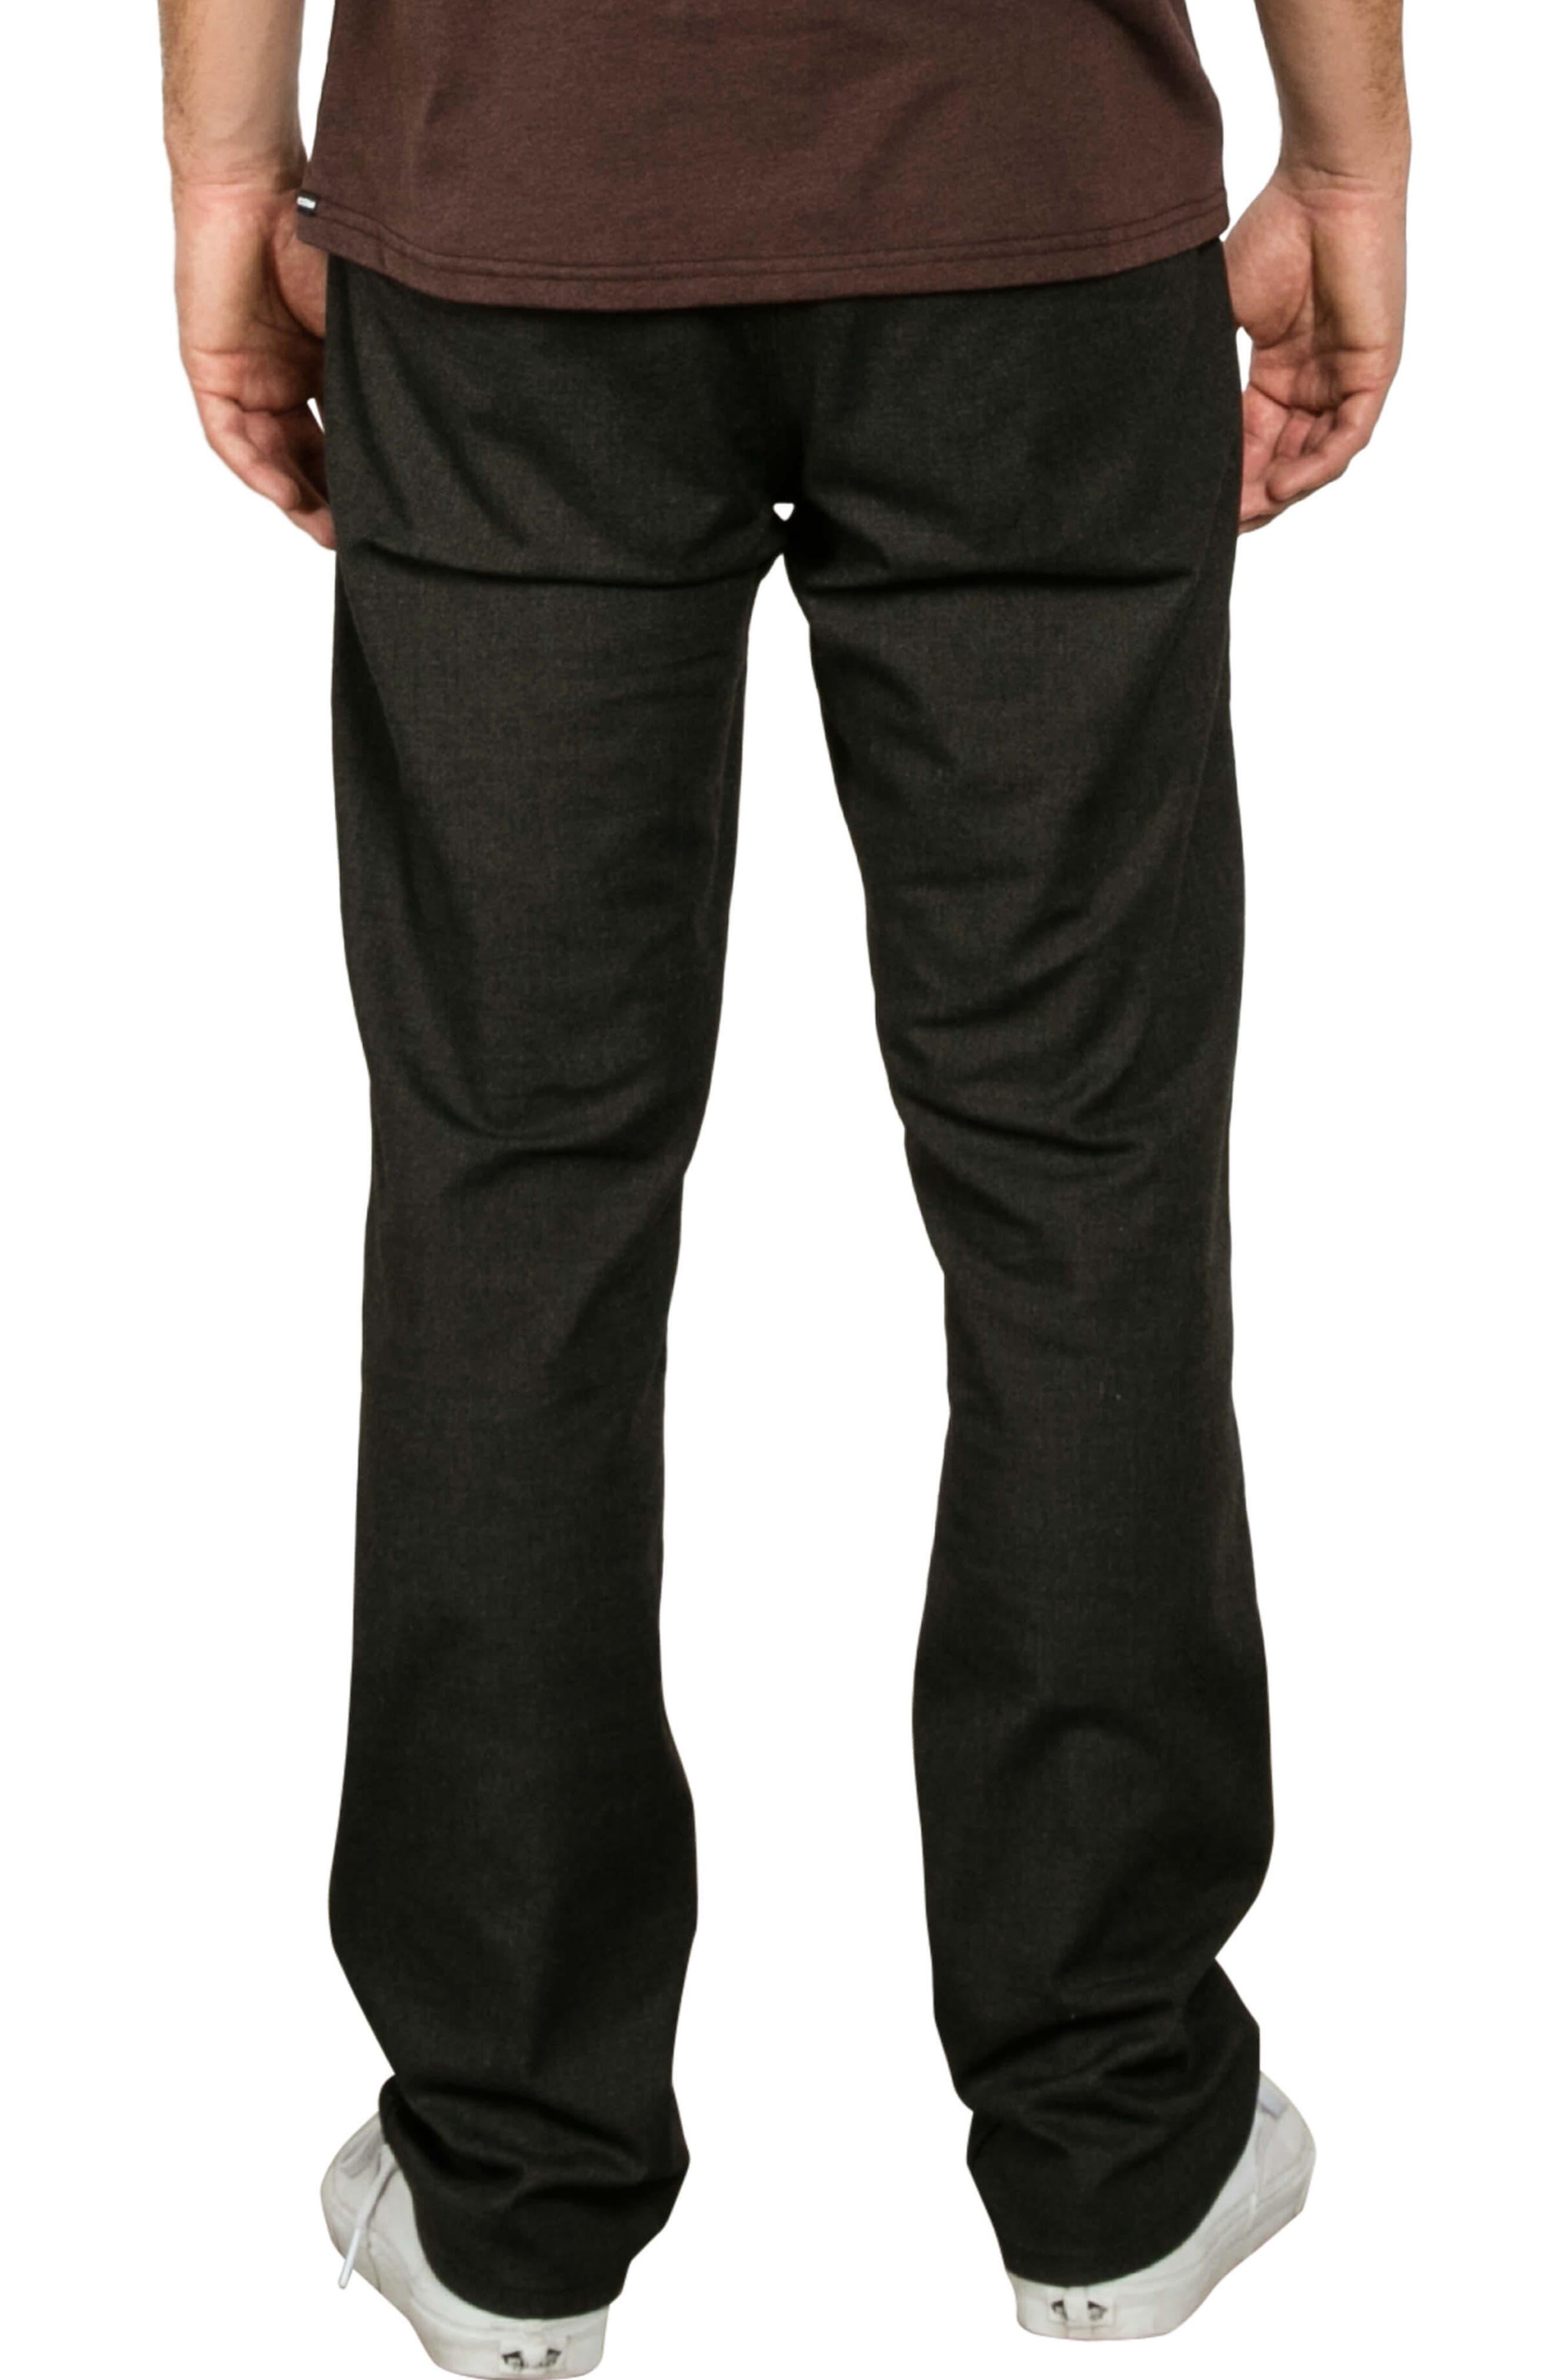 Gritter Modern Thrifter Pants,                             Alternate thumbnail 2, color,                             Grey Metal